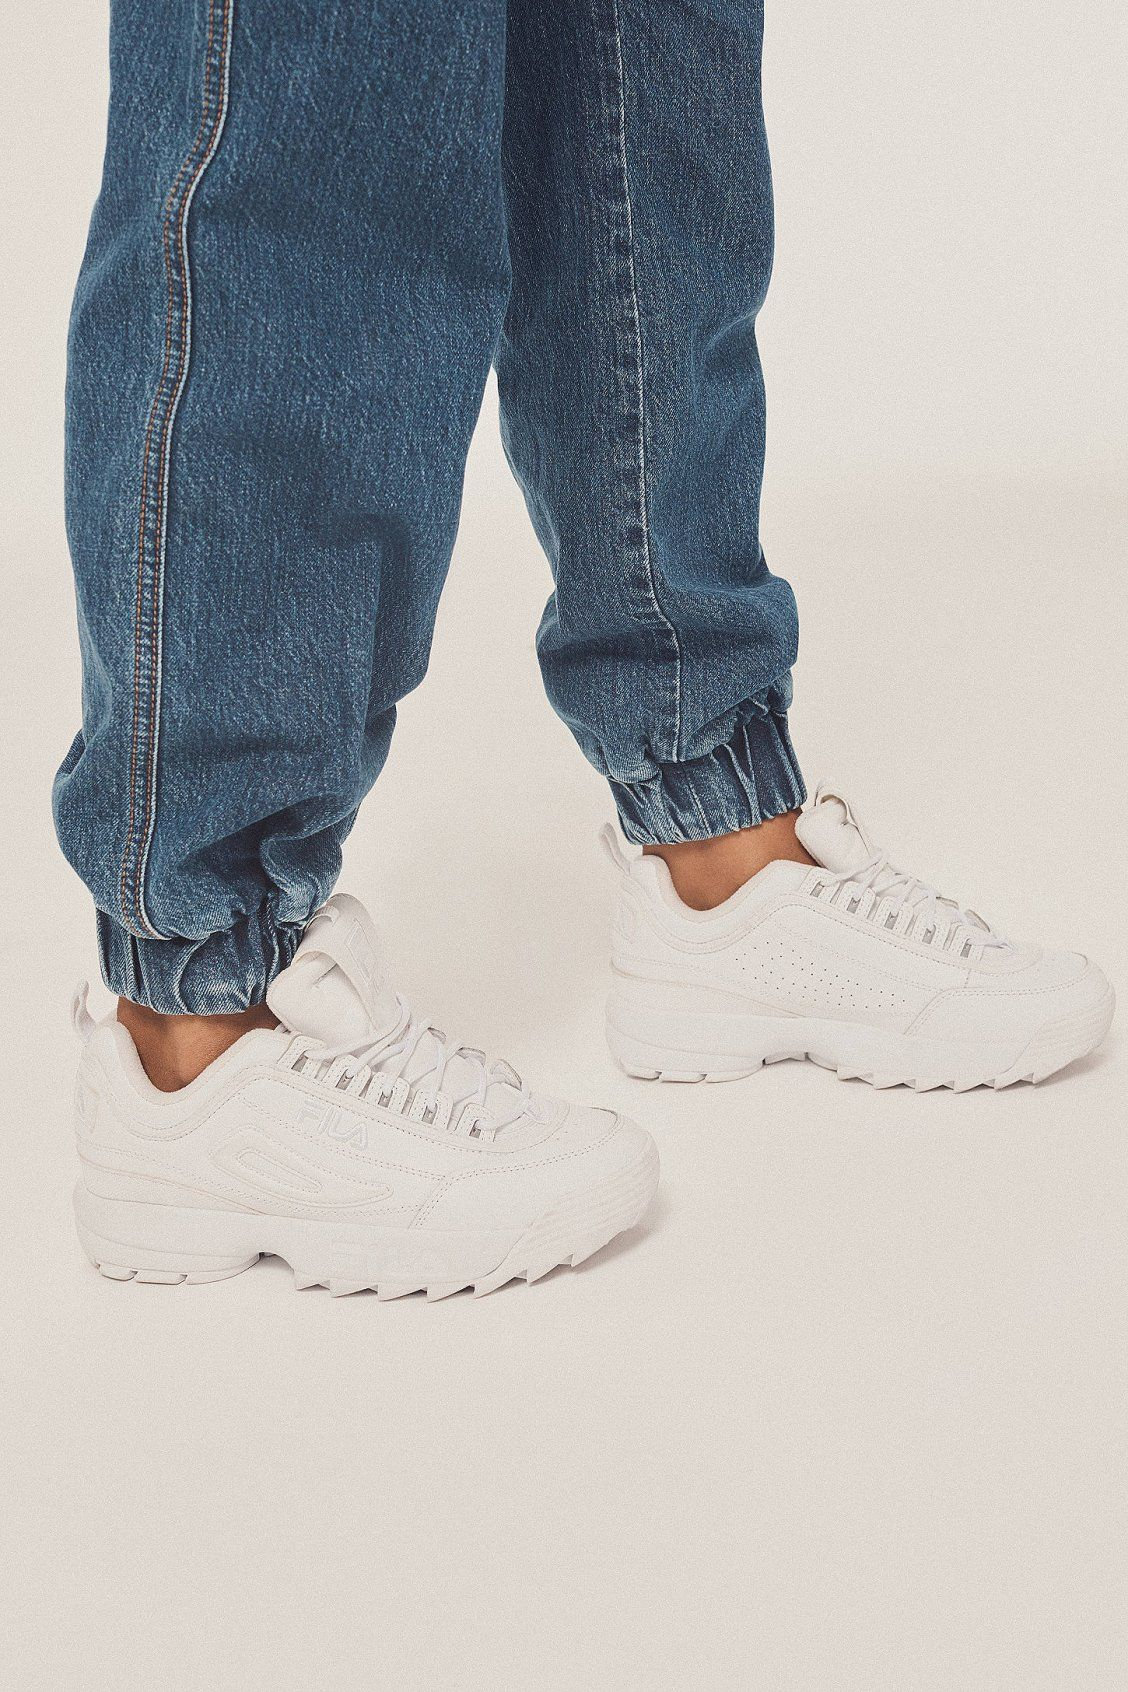 0637cd85442 FILA Disruptor 2 Premium Mono Sneaker